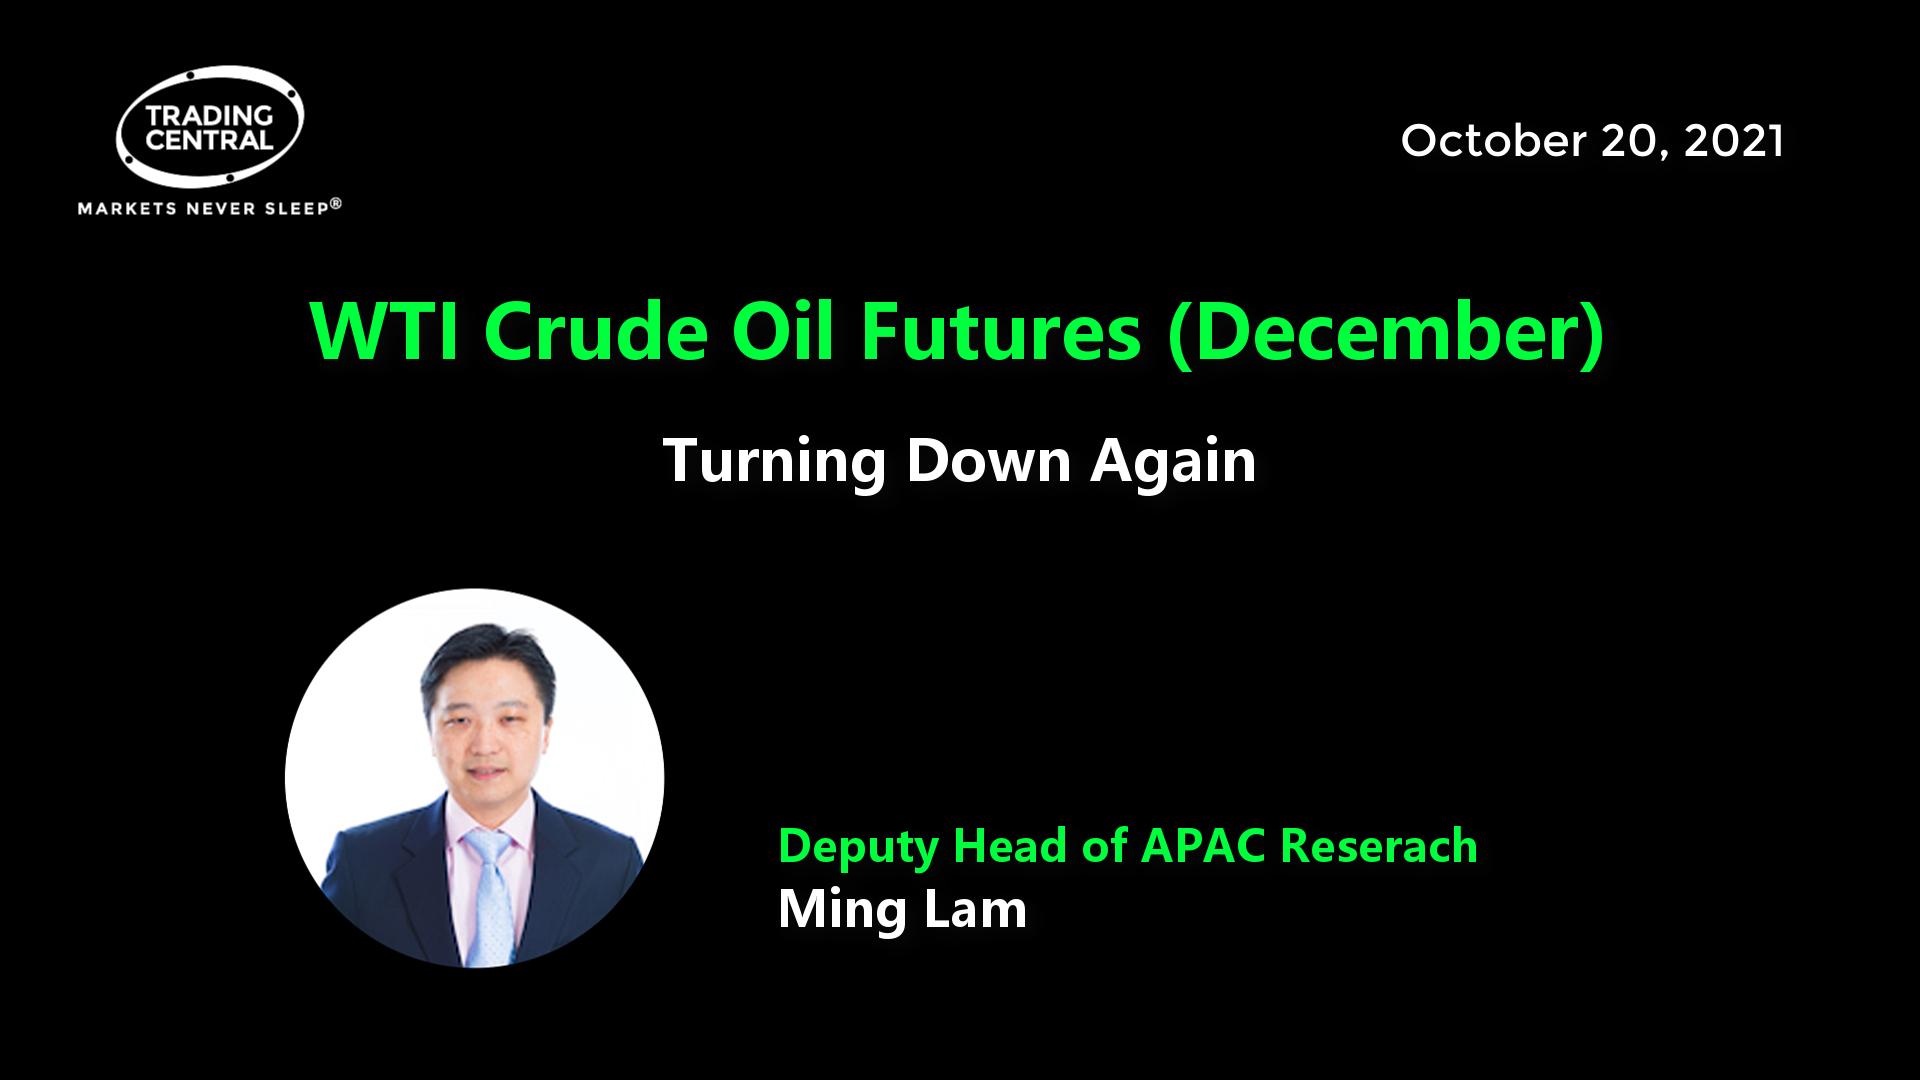 WTI Crude Oil Futures (December) - Turning Down Again